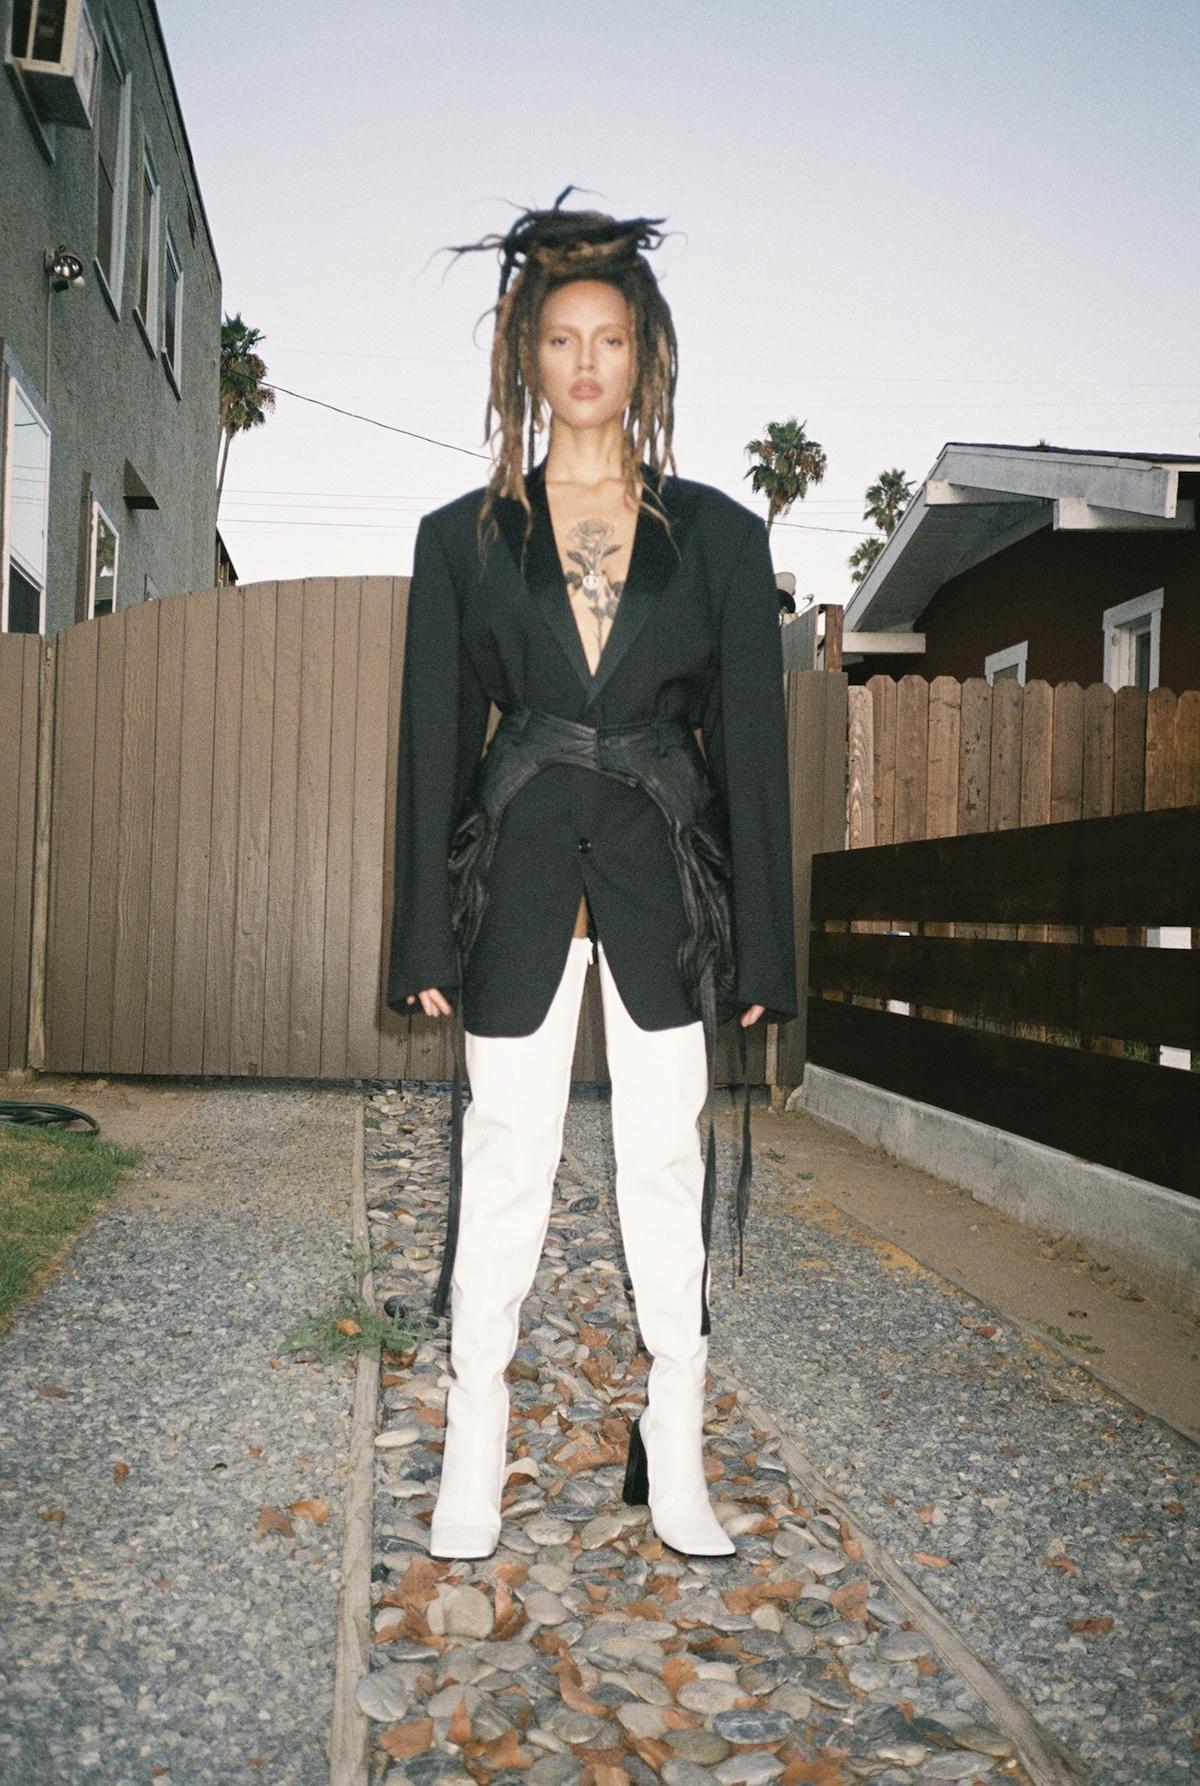 Dolce & Gabbana, Blazer, Vintage, Leather Pocket Chaps, Balenciaga Boots